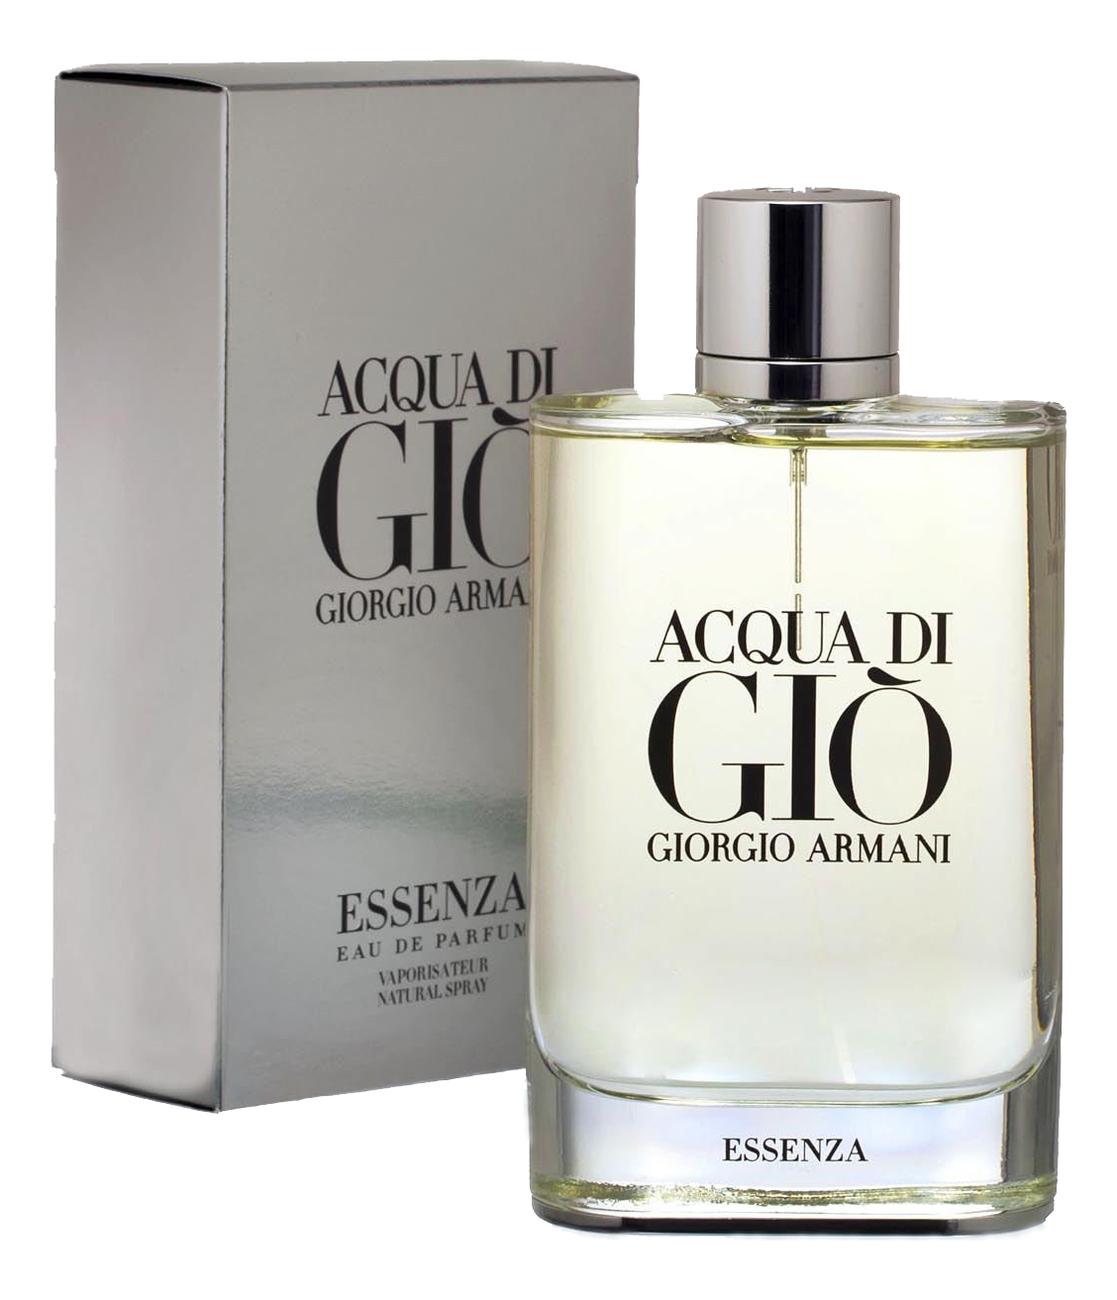 Купить Acqua di Gio Essenza pour homme: парфюмерная вода 180мл, Giorgio Armani